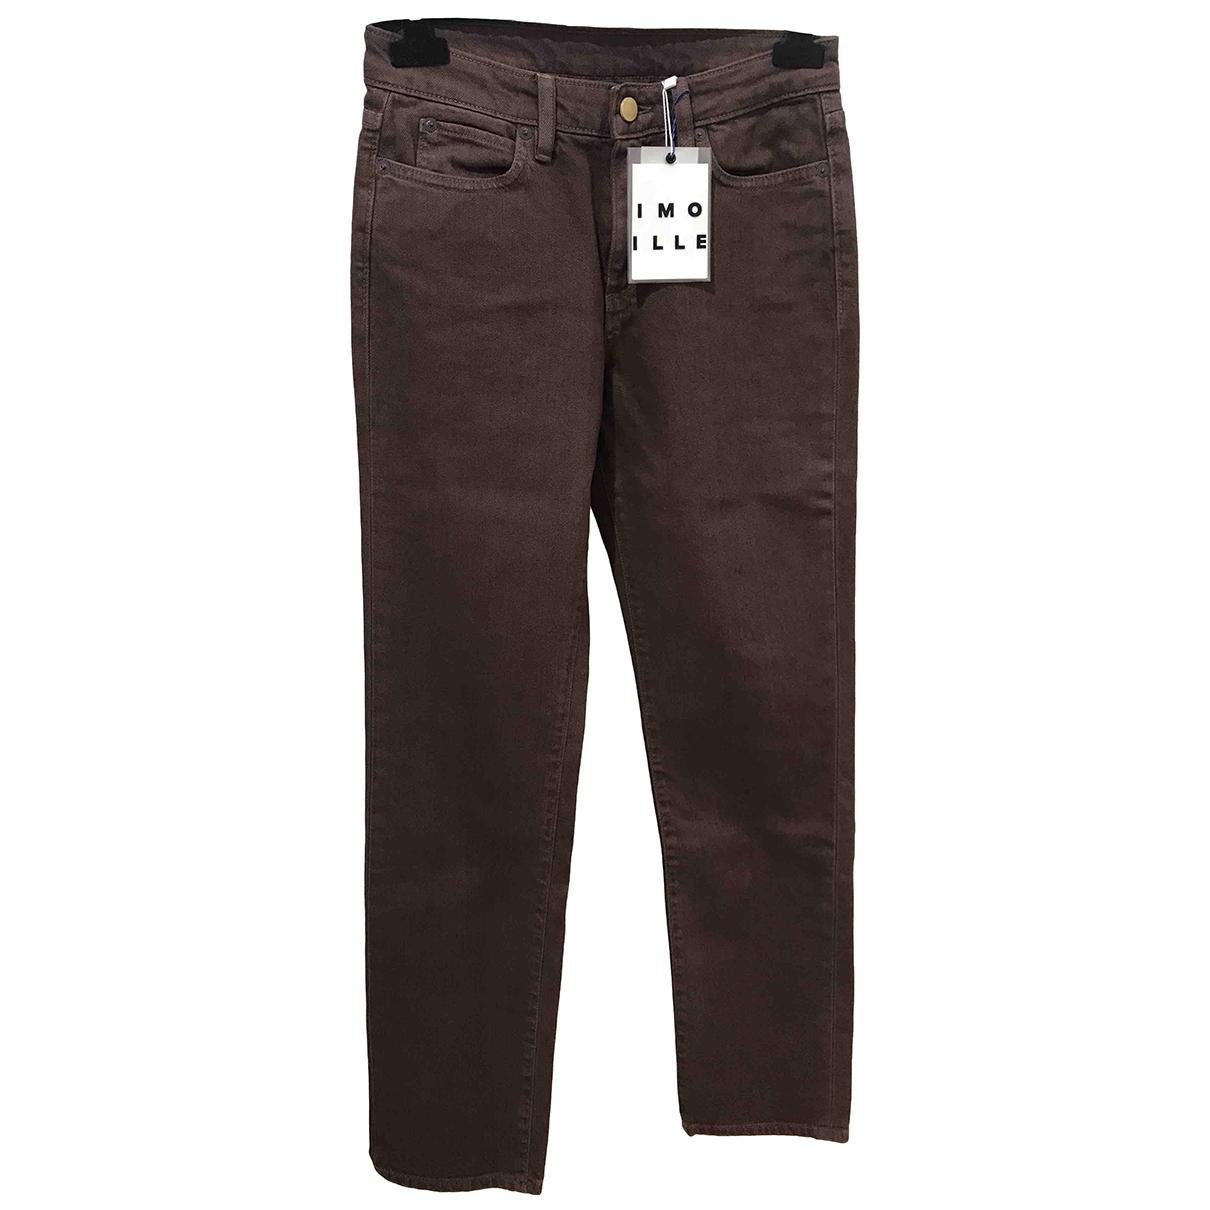 Simon Miller \N Brown Cotton Jeans for Women 26 US